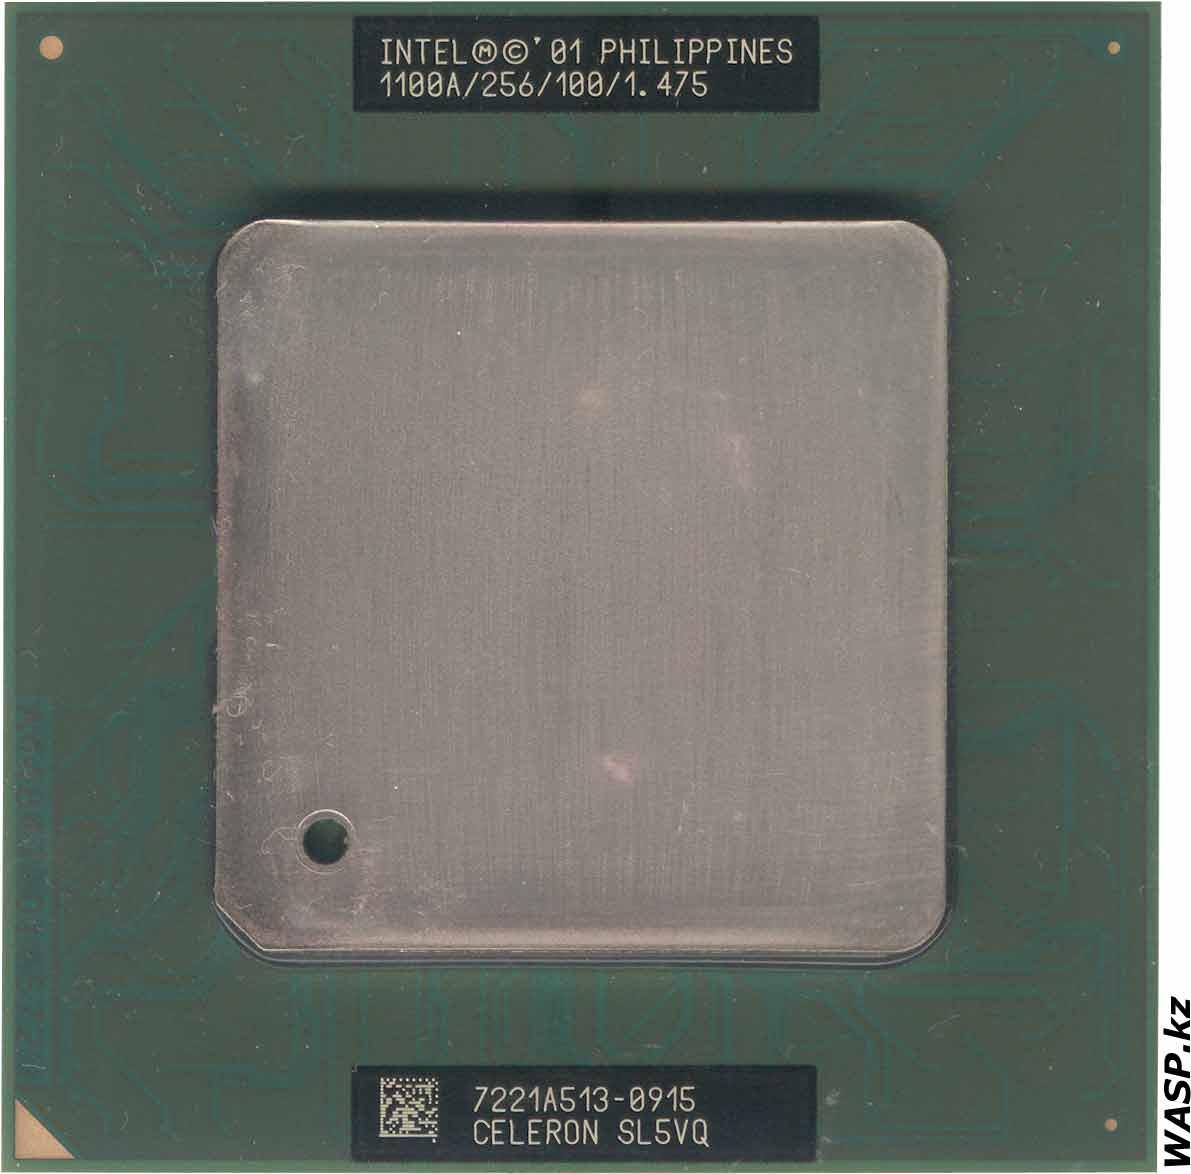 Intel Celeron 1100A процессор на ядре Tualatin